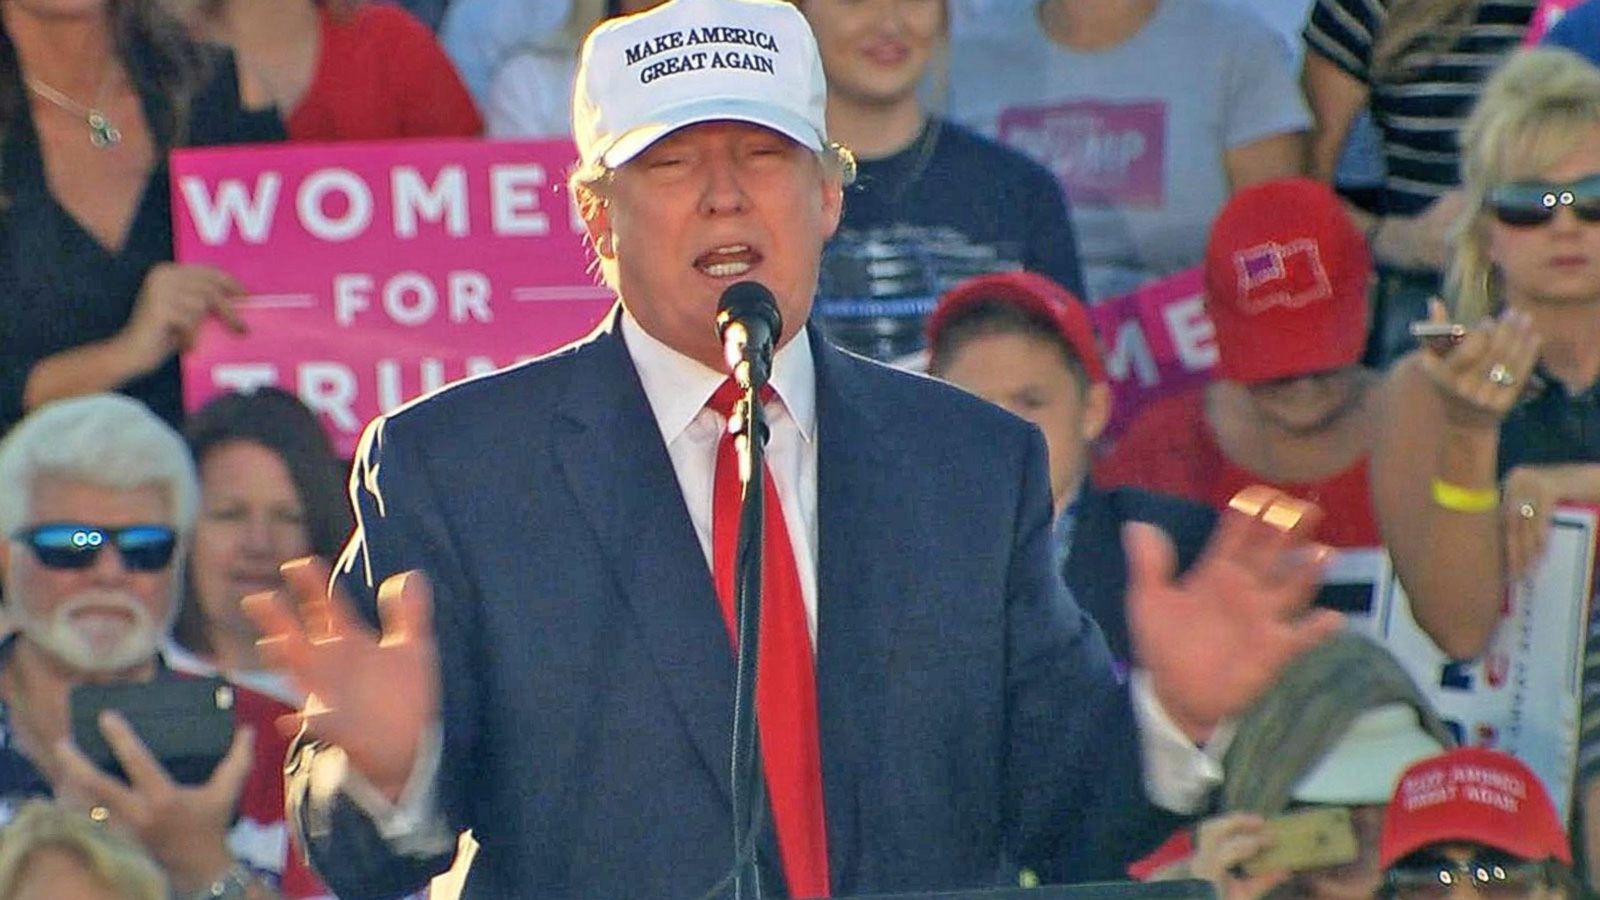 VIDEO: Donald Trump Disputes Polls, Threatens Lawsuits